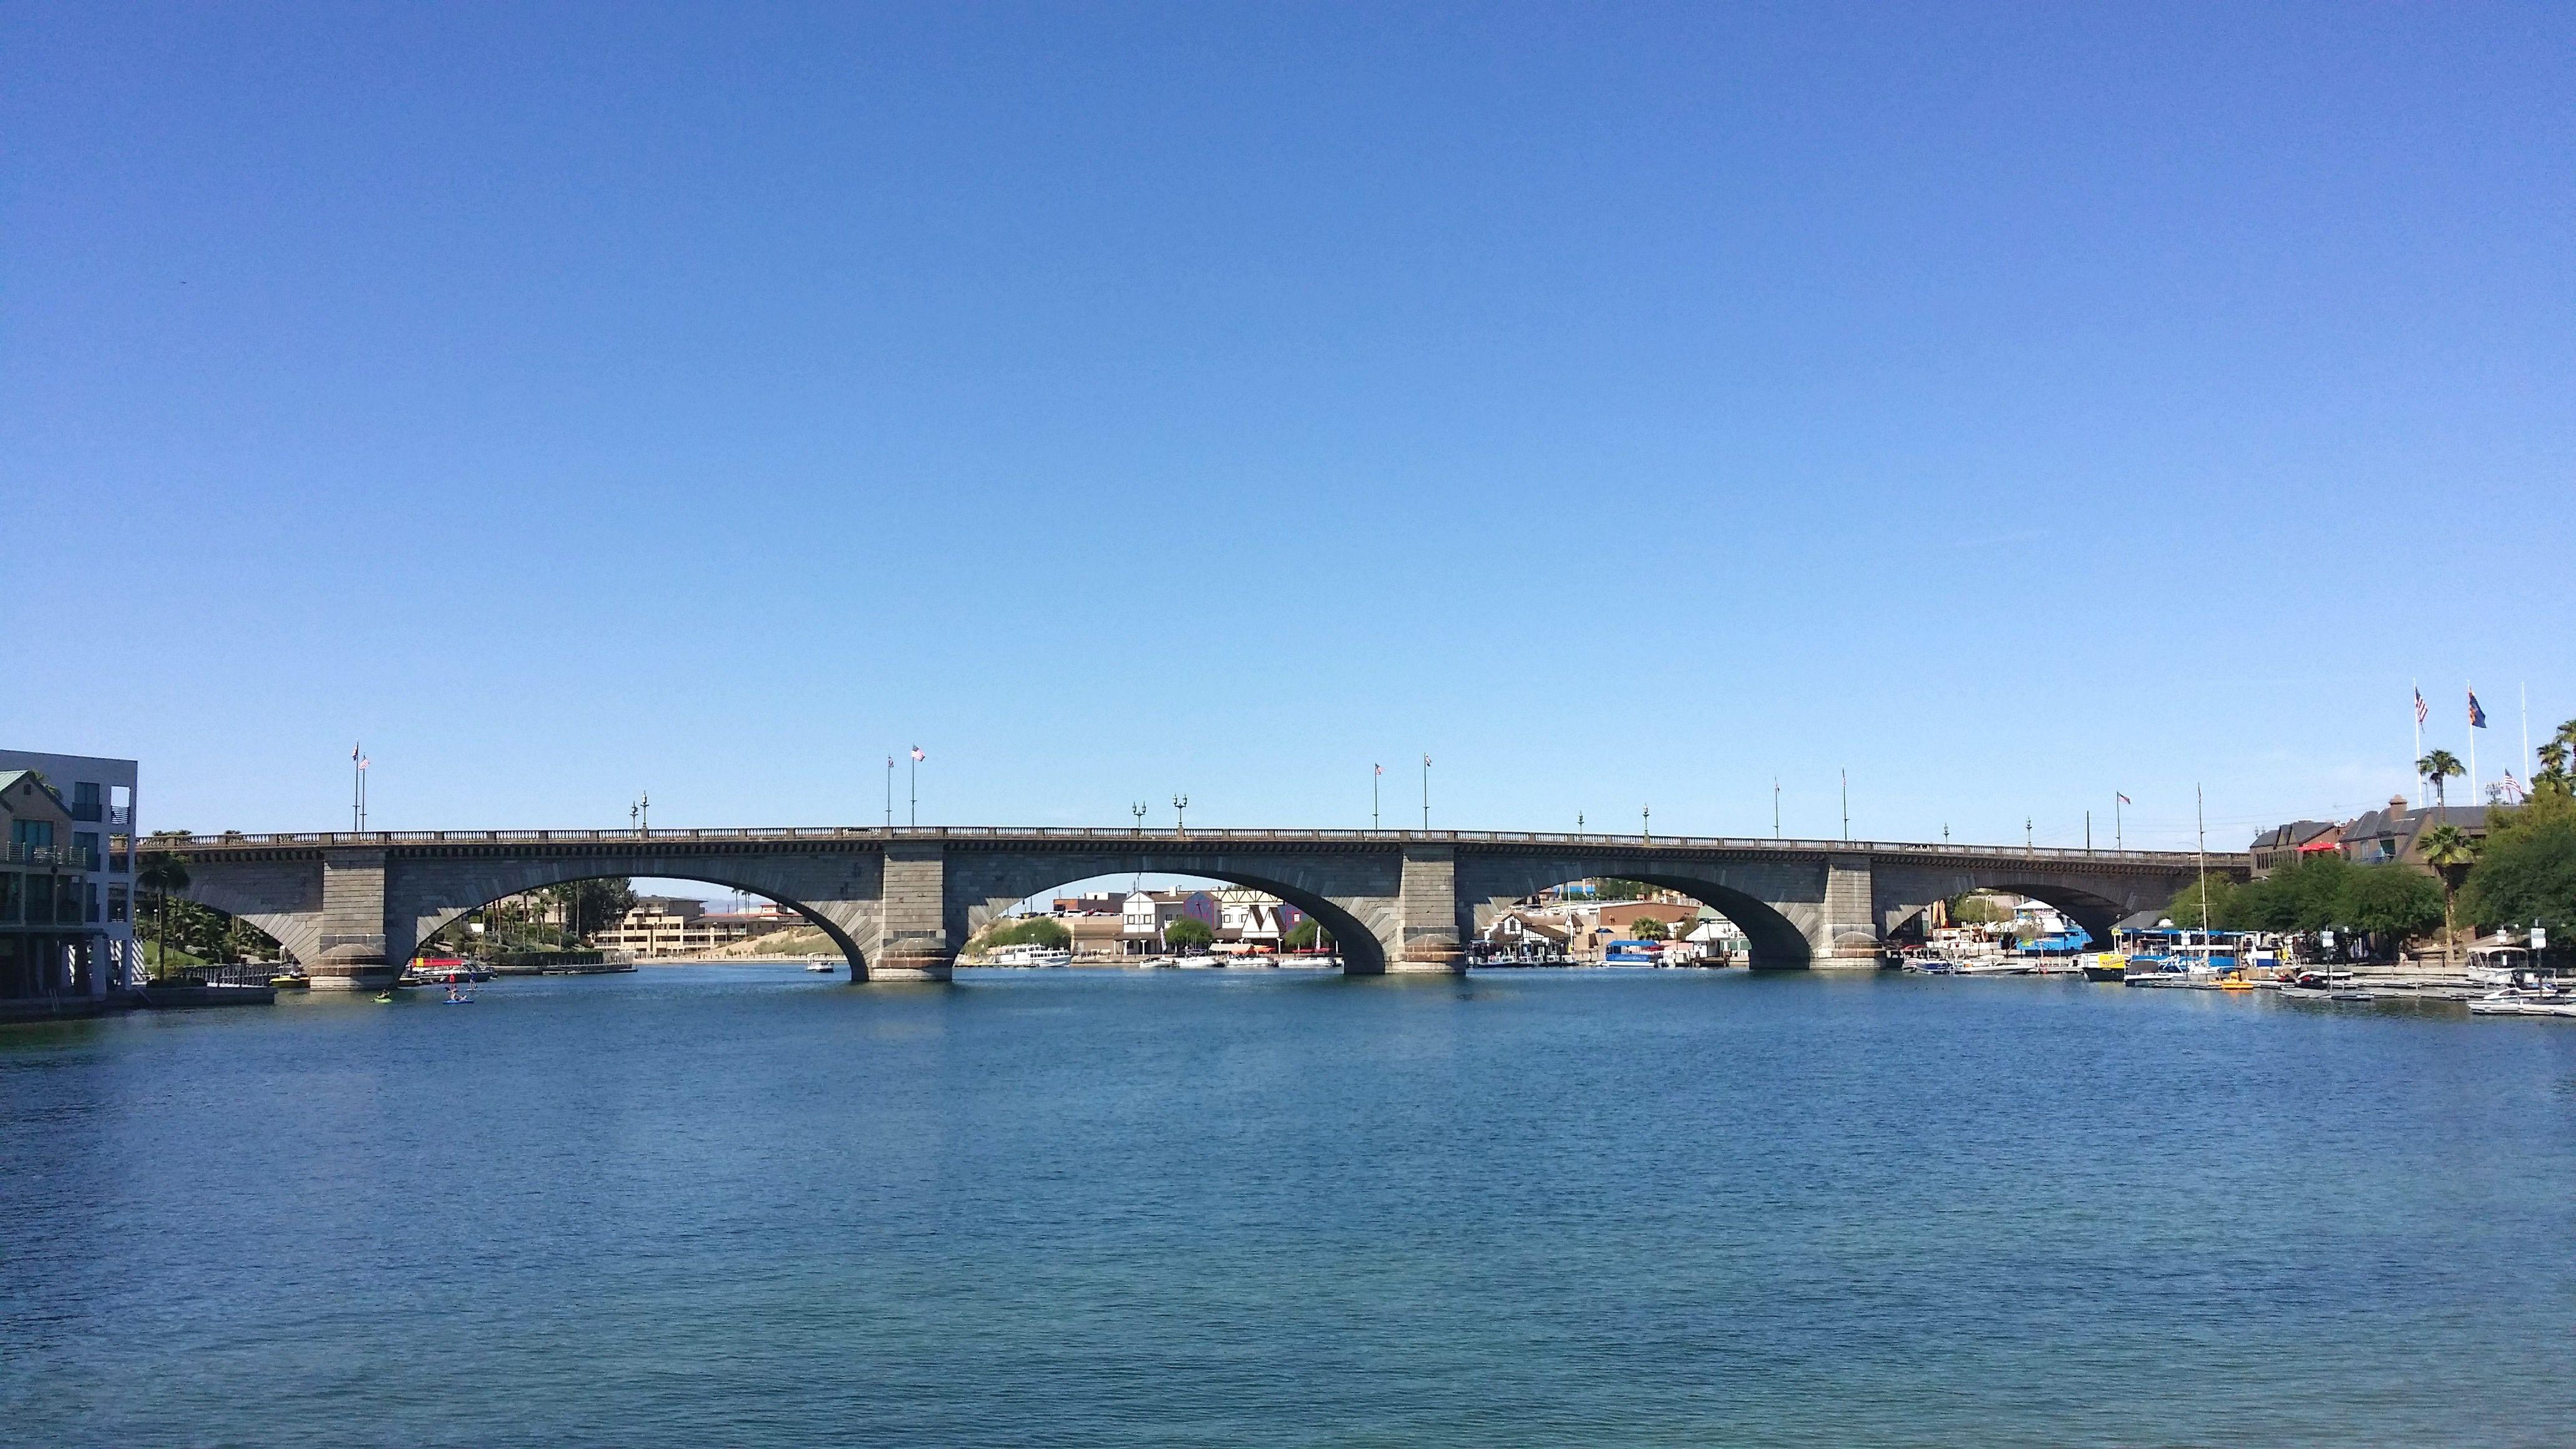 London Bridge Lake Havasu City, Arizona Lake havasu